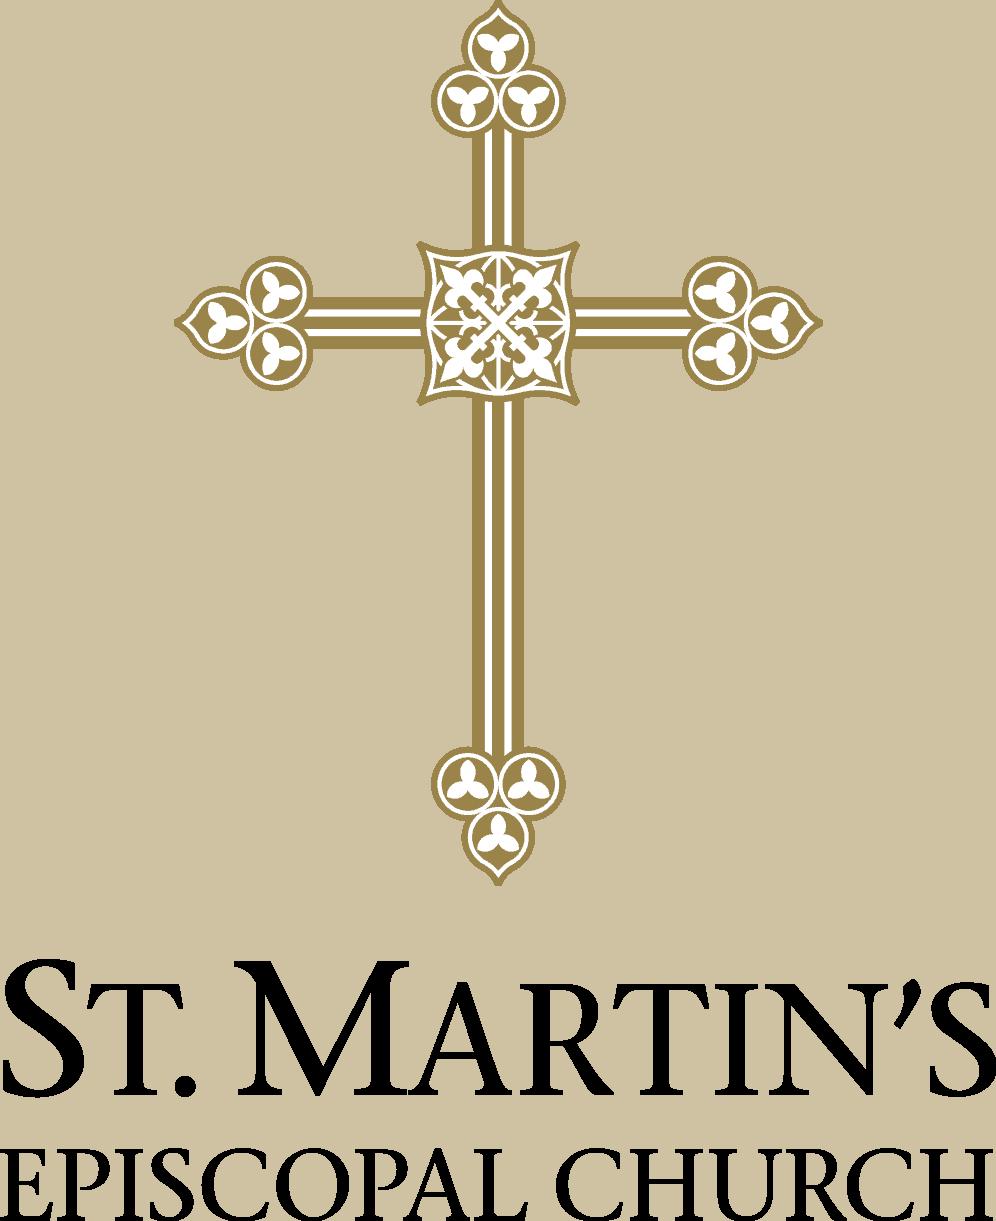 St. Martin's Episcopal Church